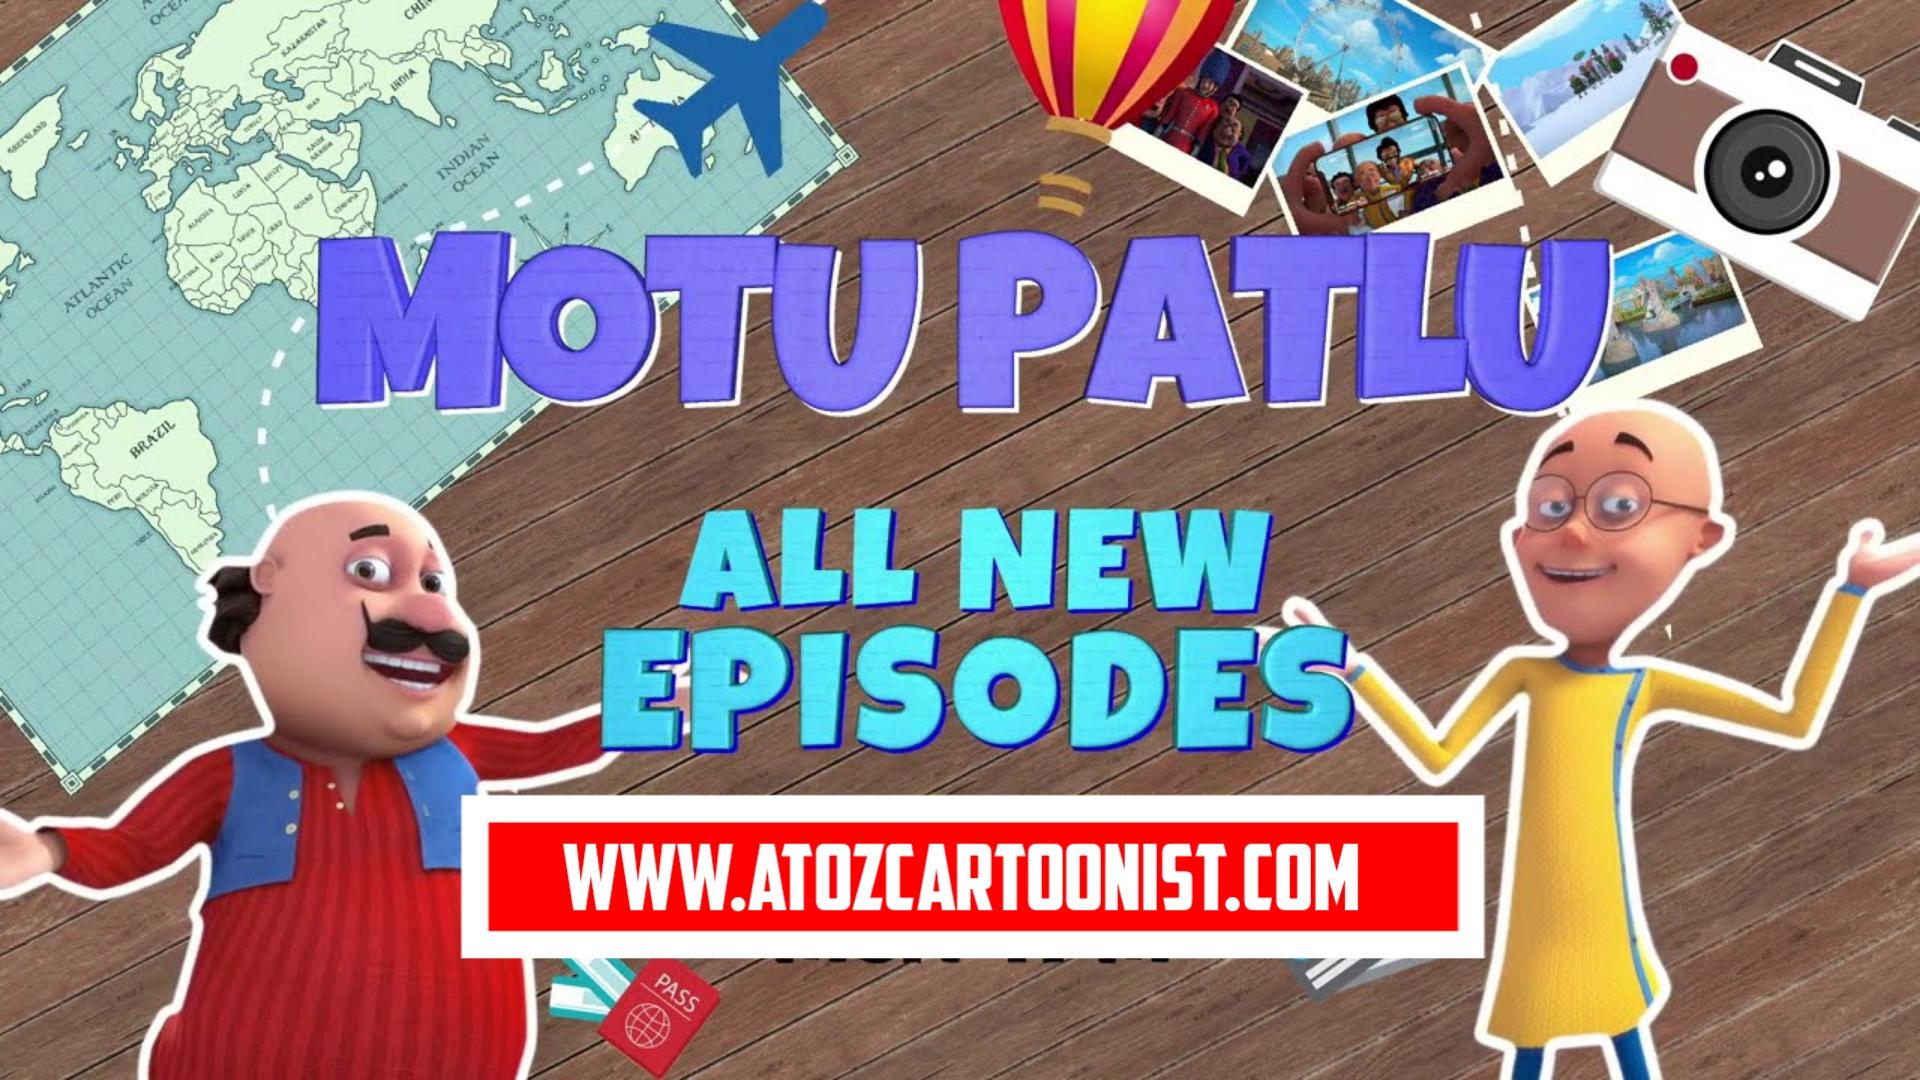 MOTU PATLU ALL NEW EPISODES 2021 IN HINDI DOWNLOAD (720P HD)